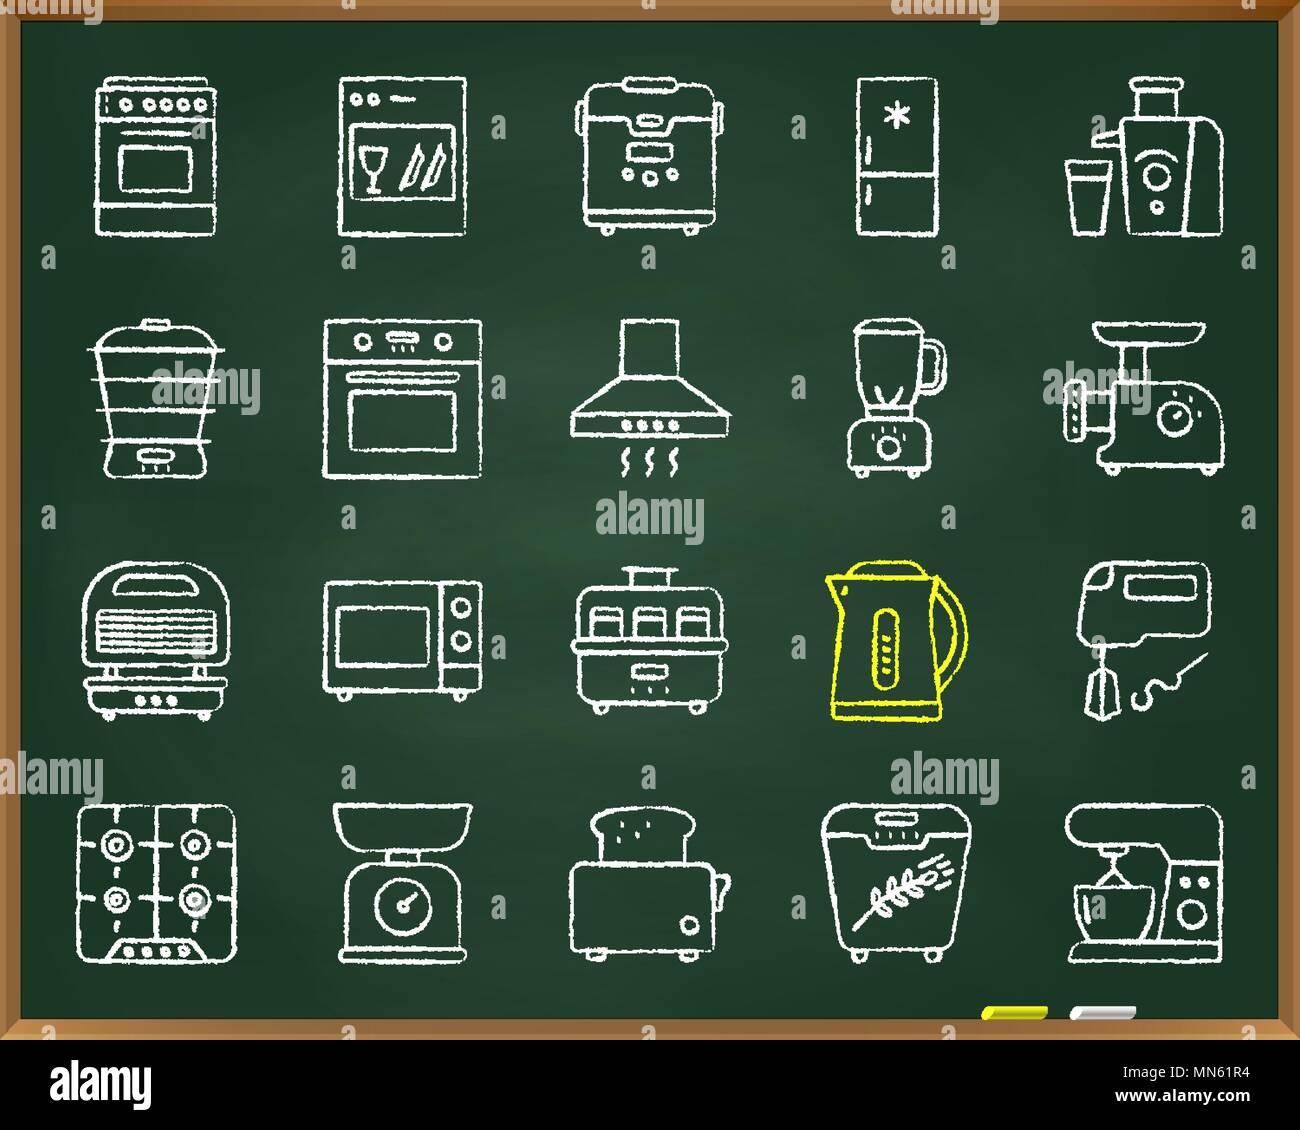 Kuchengerate Chalk Symbole Gesetzt Uberblick Web Sign Kit Der